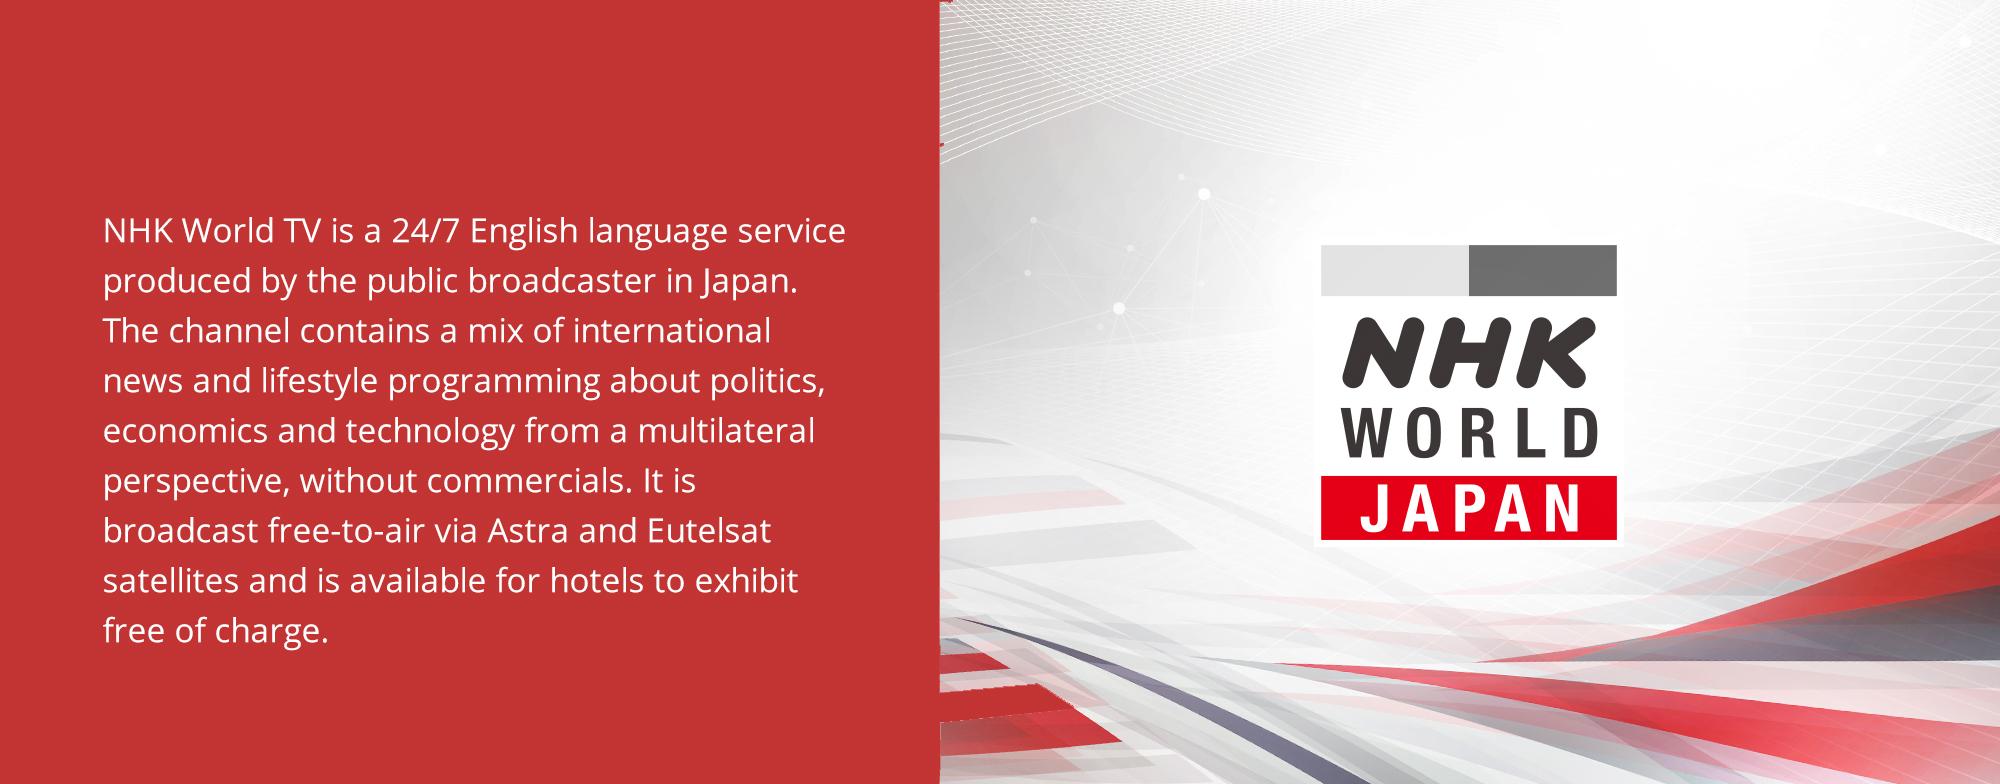 NHK world information